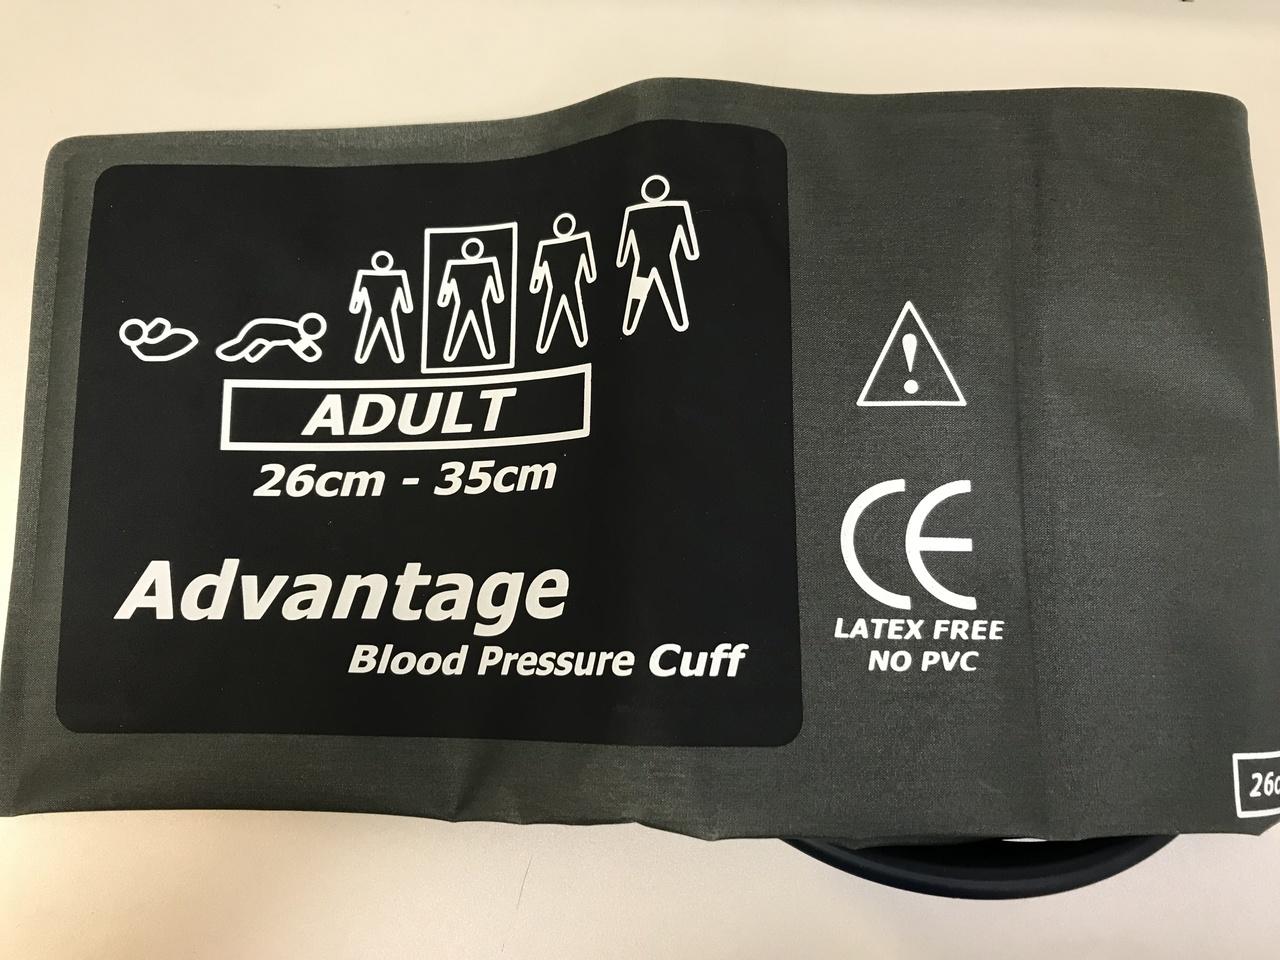 Advantage Blood Pressure Cuff (Adult 26-35 cm)